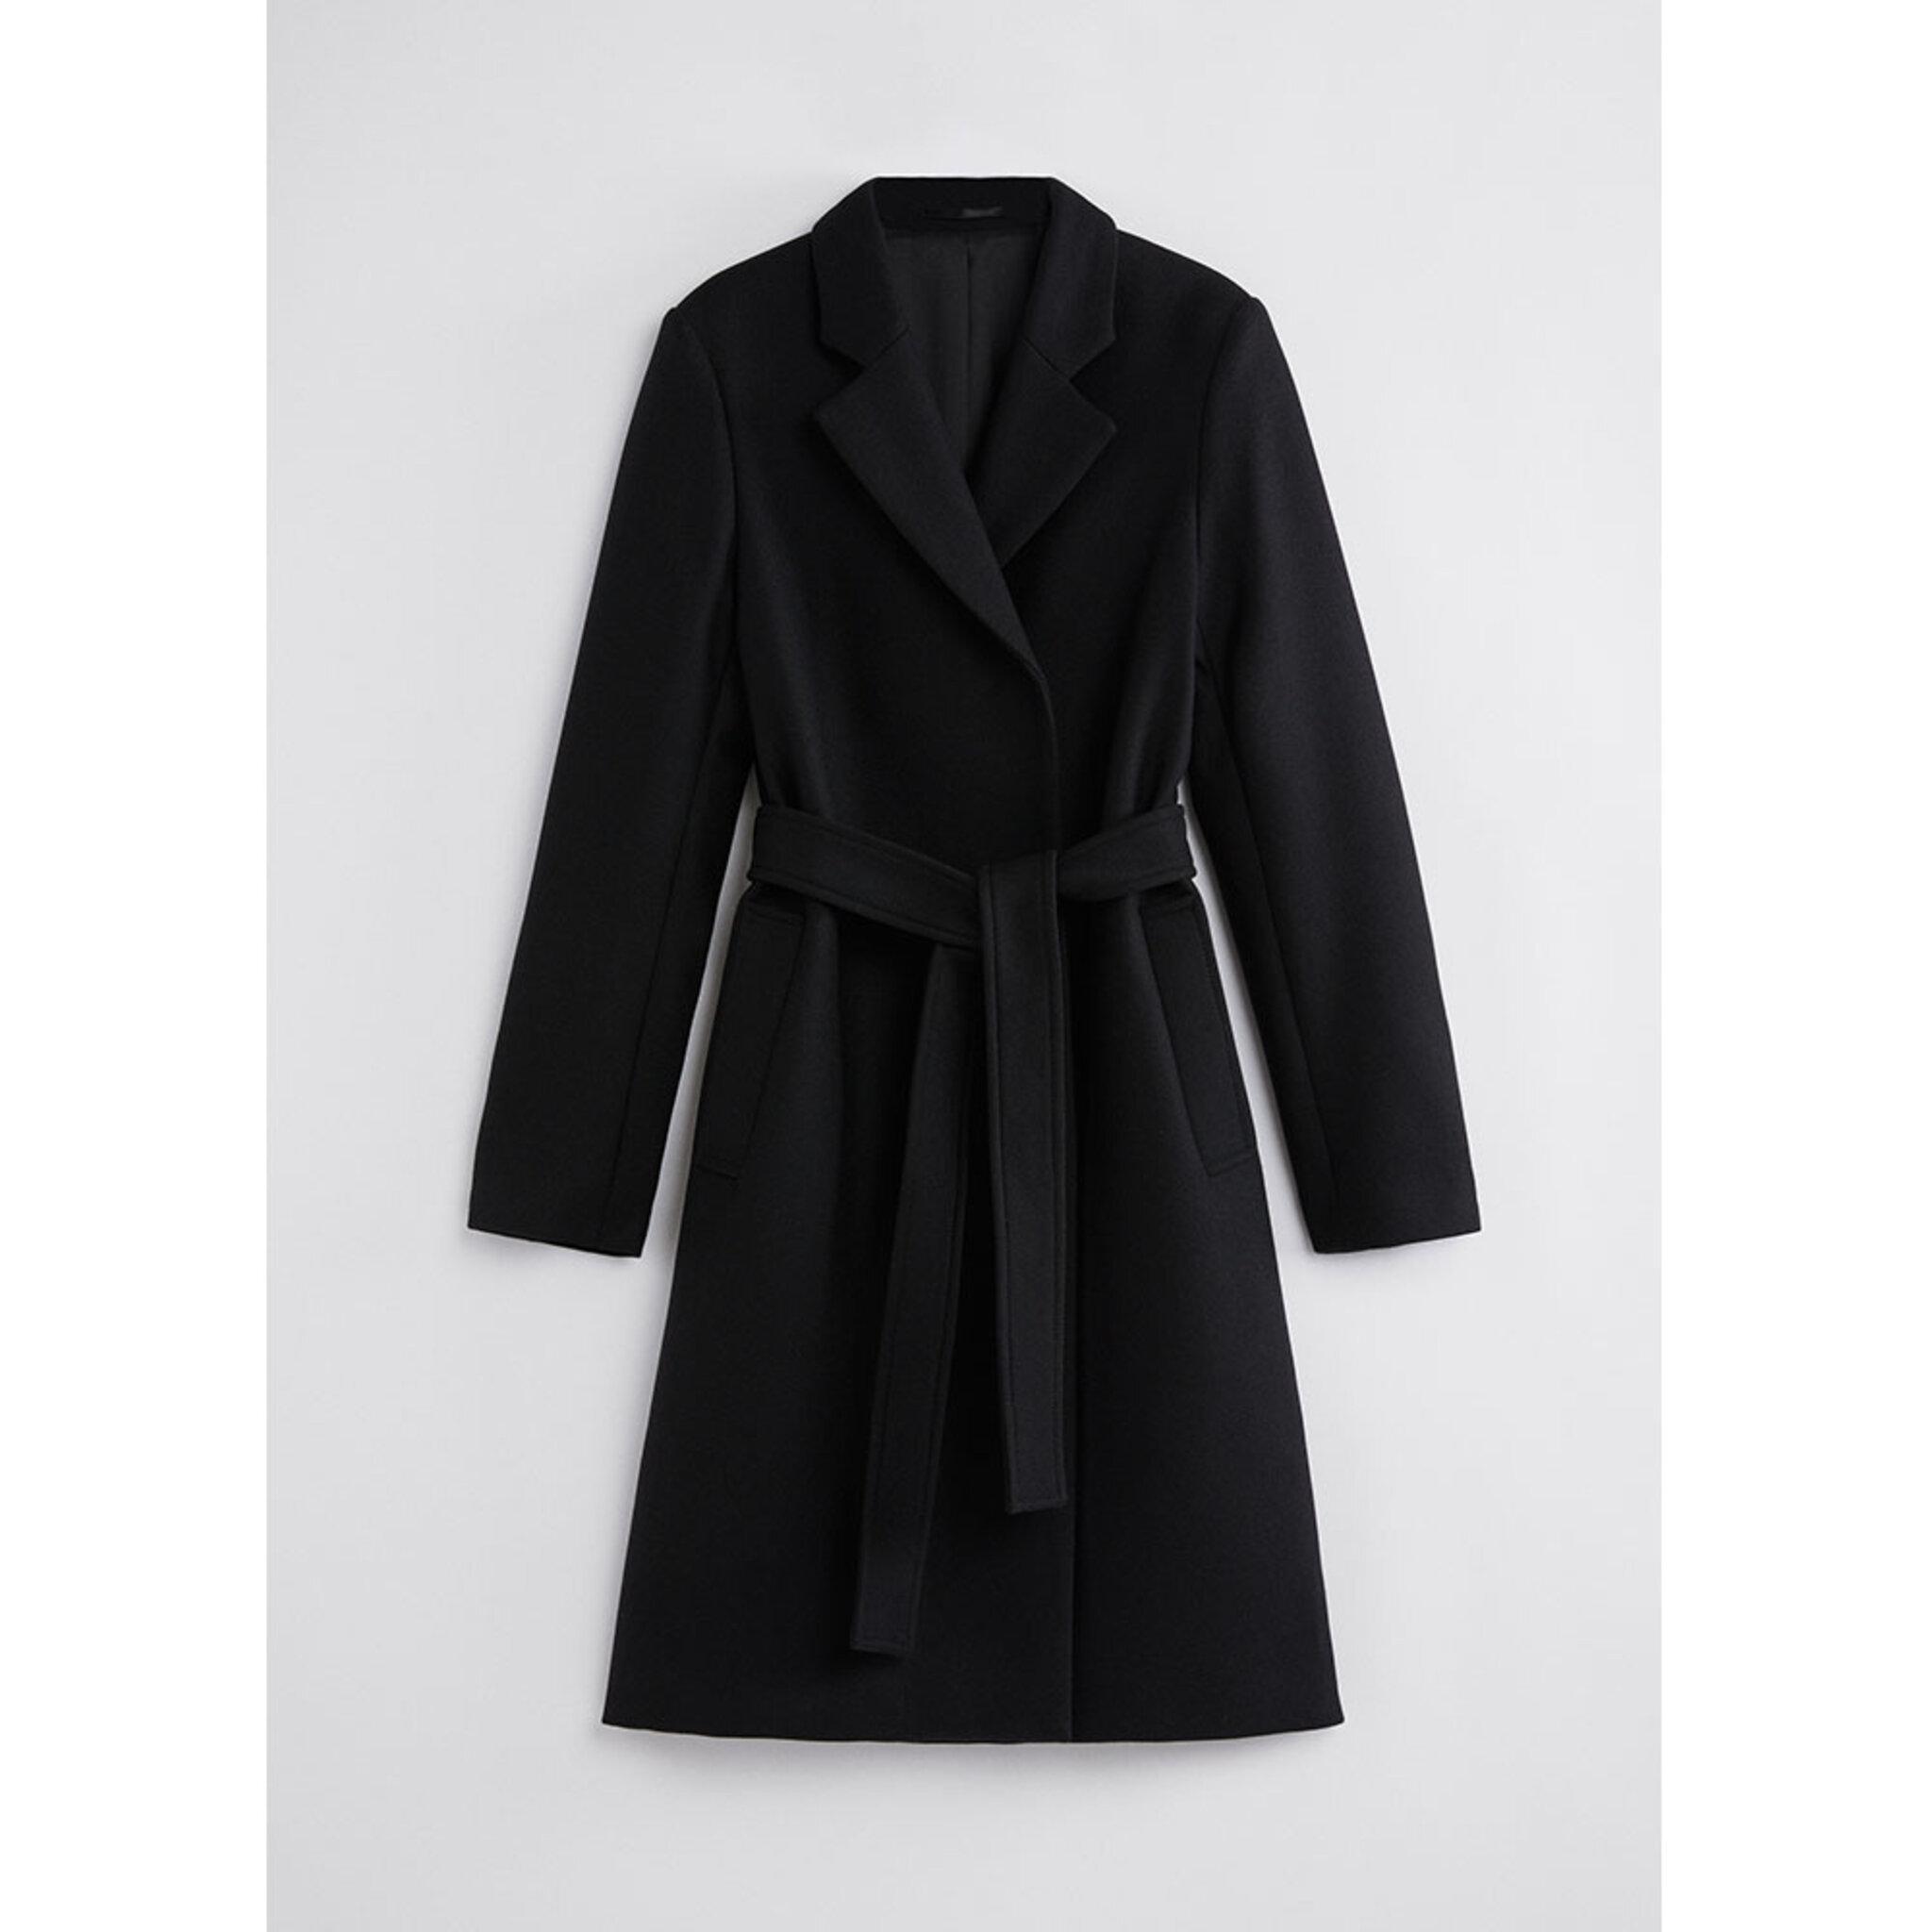 Kaya Coat